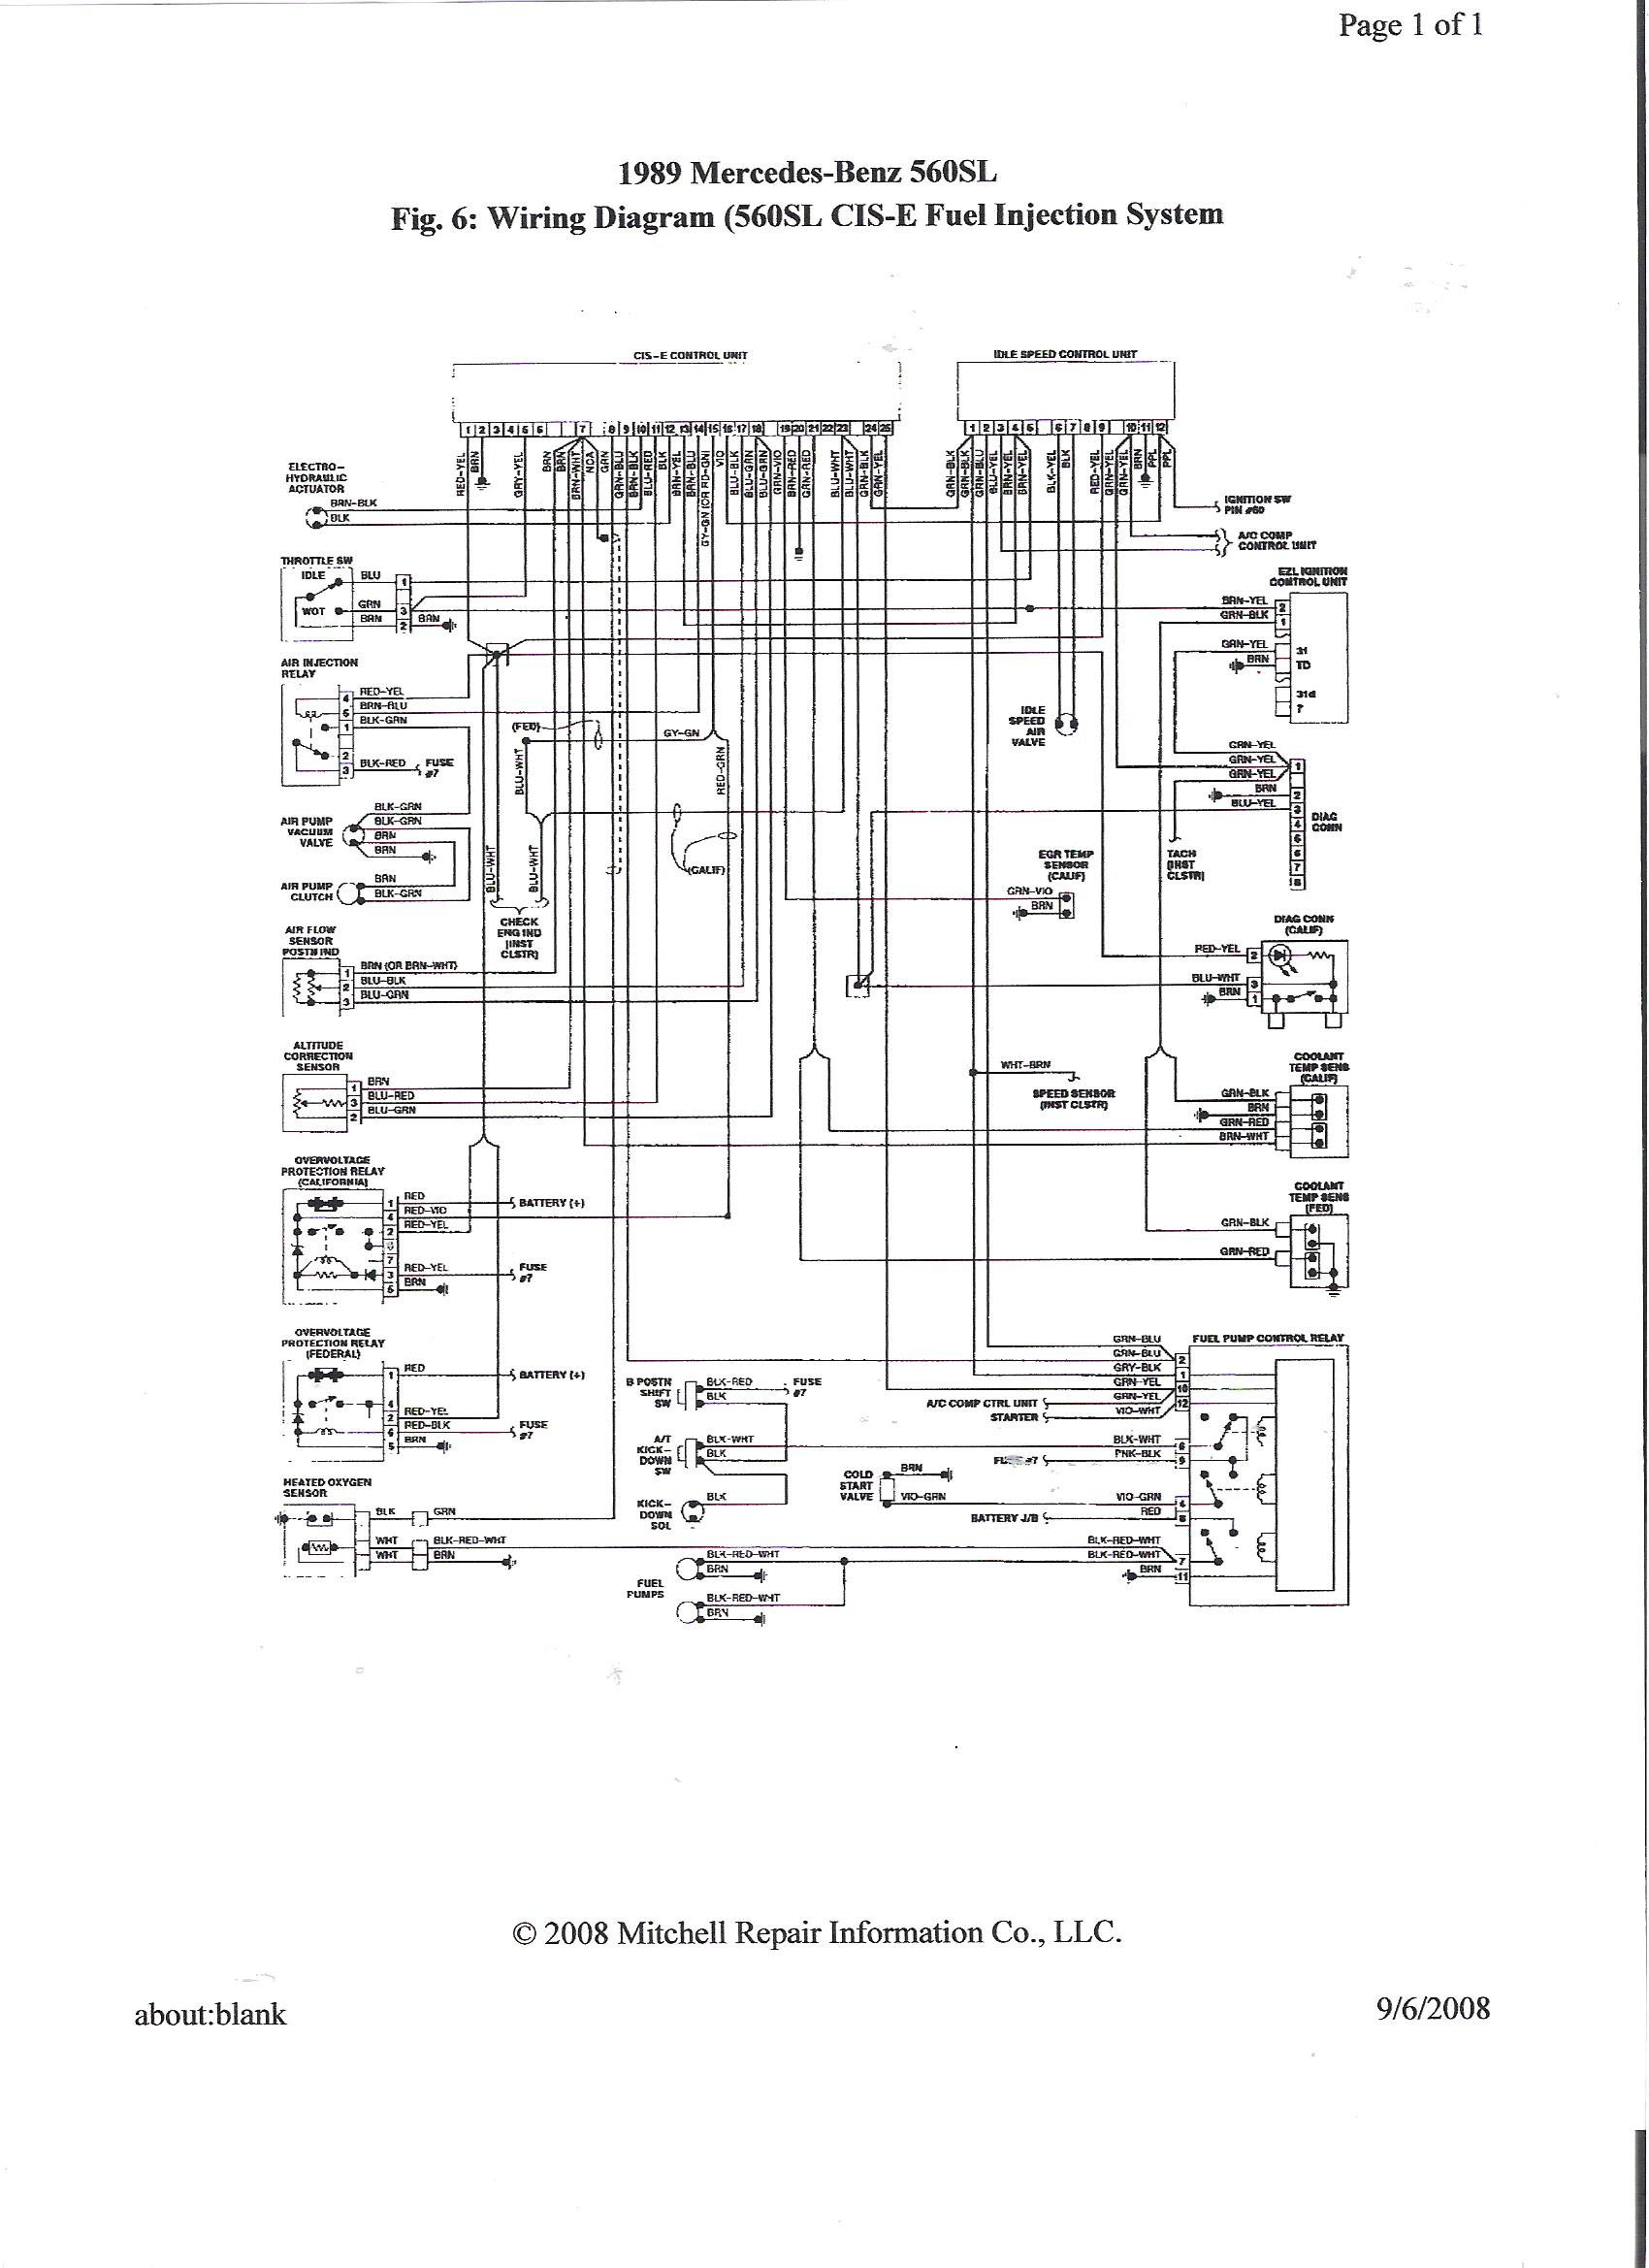 Diagram 1986 Mercedes Benz 560 Engine Diagram Full Version Hd Quality Engine Diagram 101581 Wired1inc Vincentescrive Fr